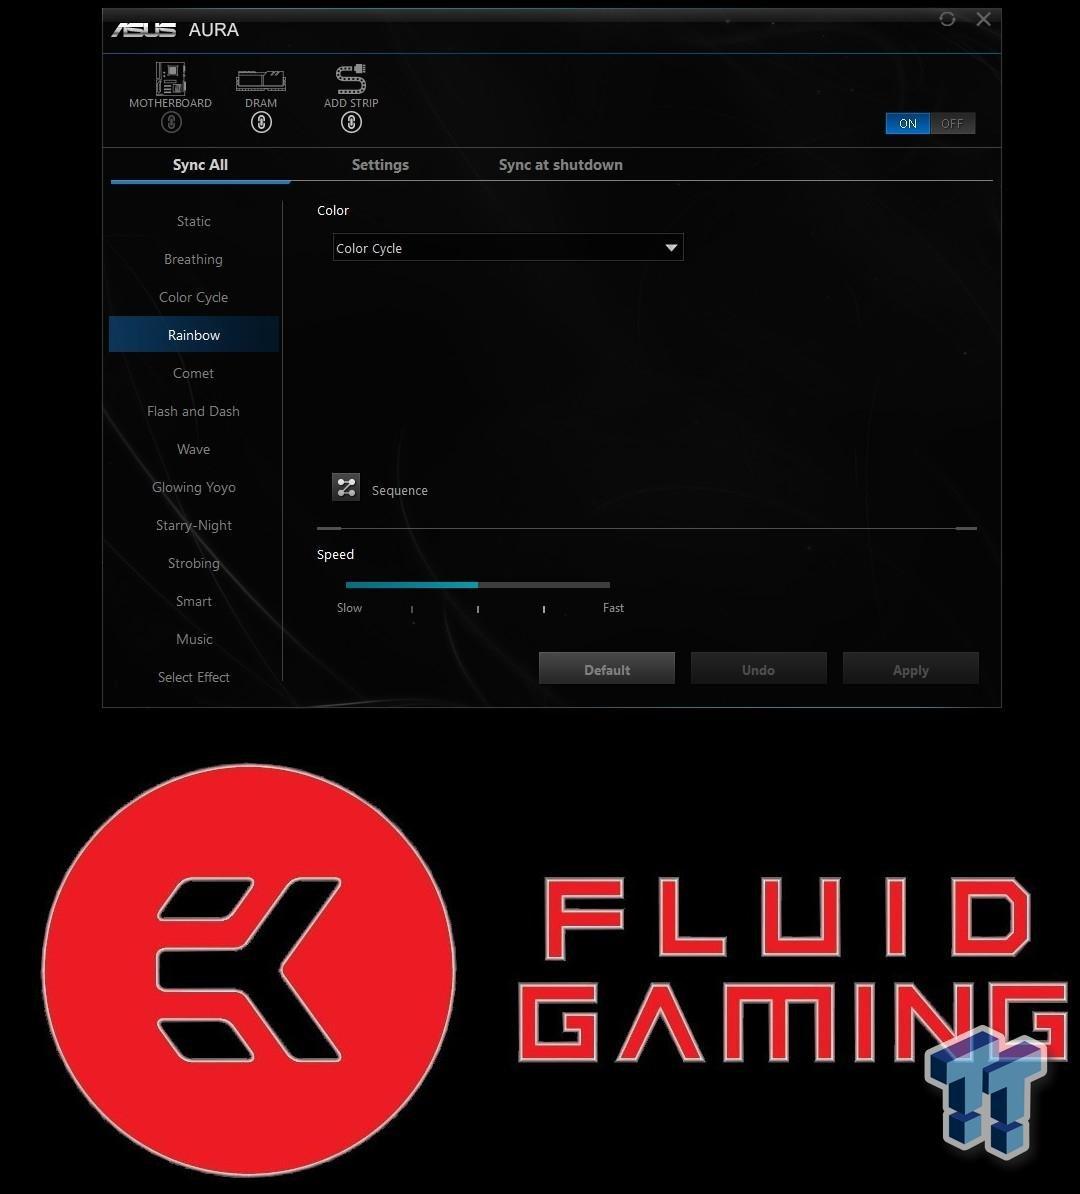 EK Fluid Gaming Vanquish 275-AG Liquid-Cooled Gaming PC Review 47 | TweakTown.com